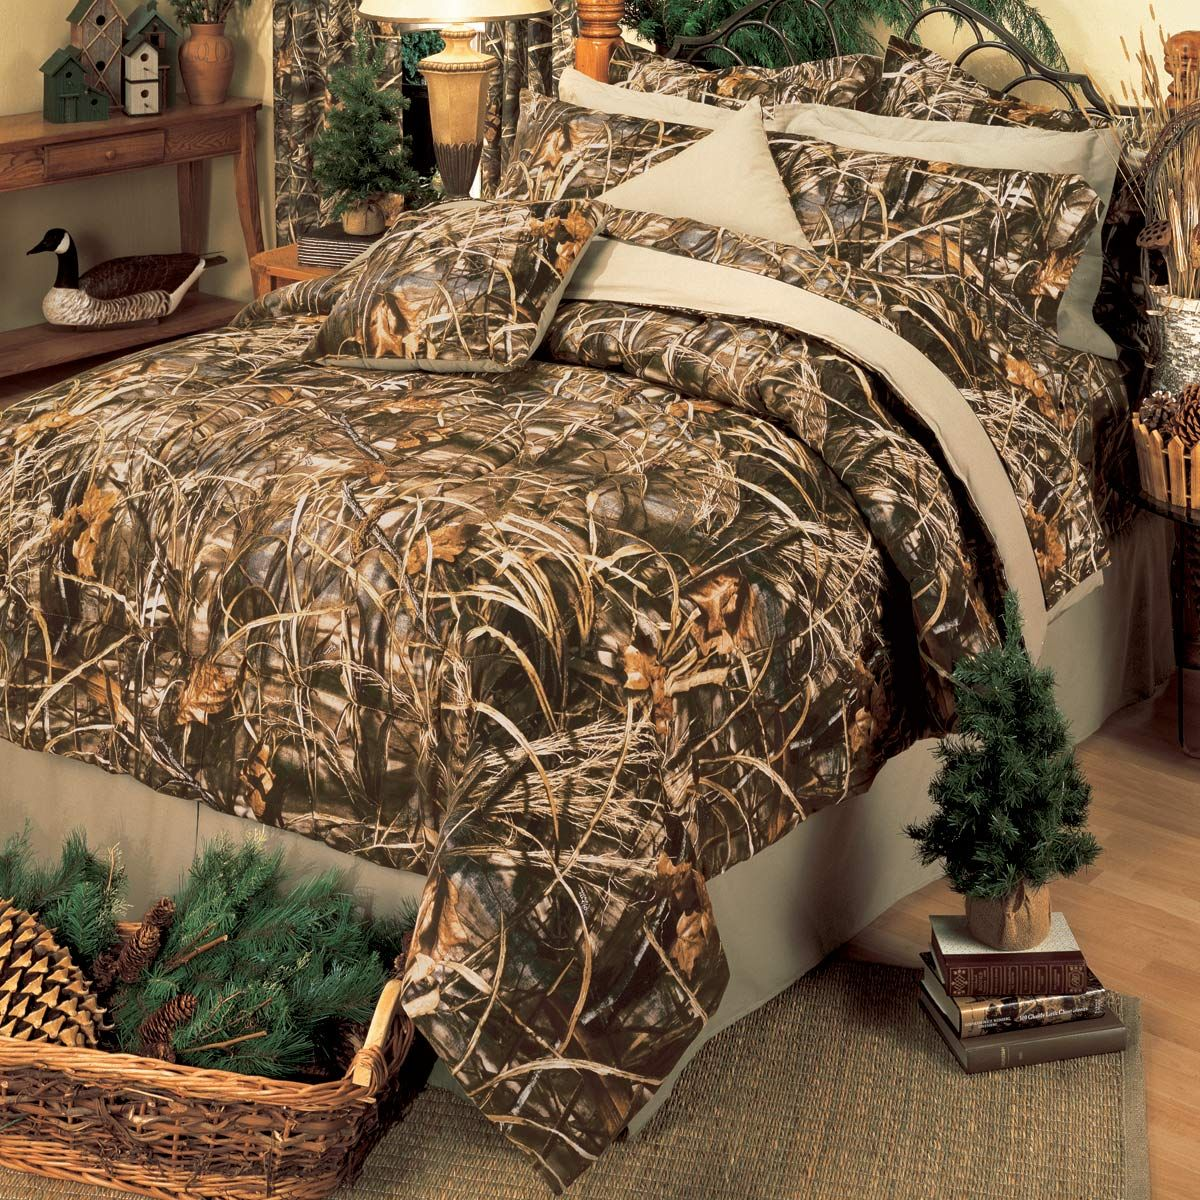 Realtree Max 4 Camo Ez Bed Set Queen Camo Comforter Sets Camo